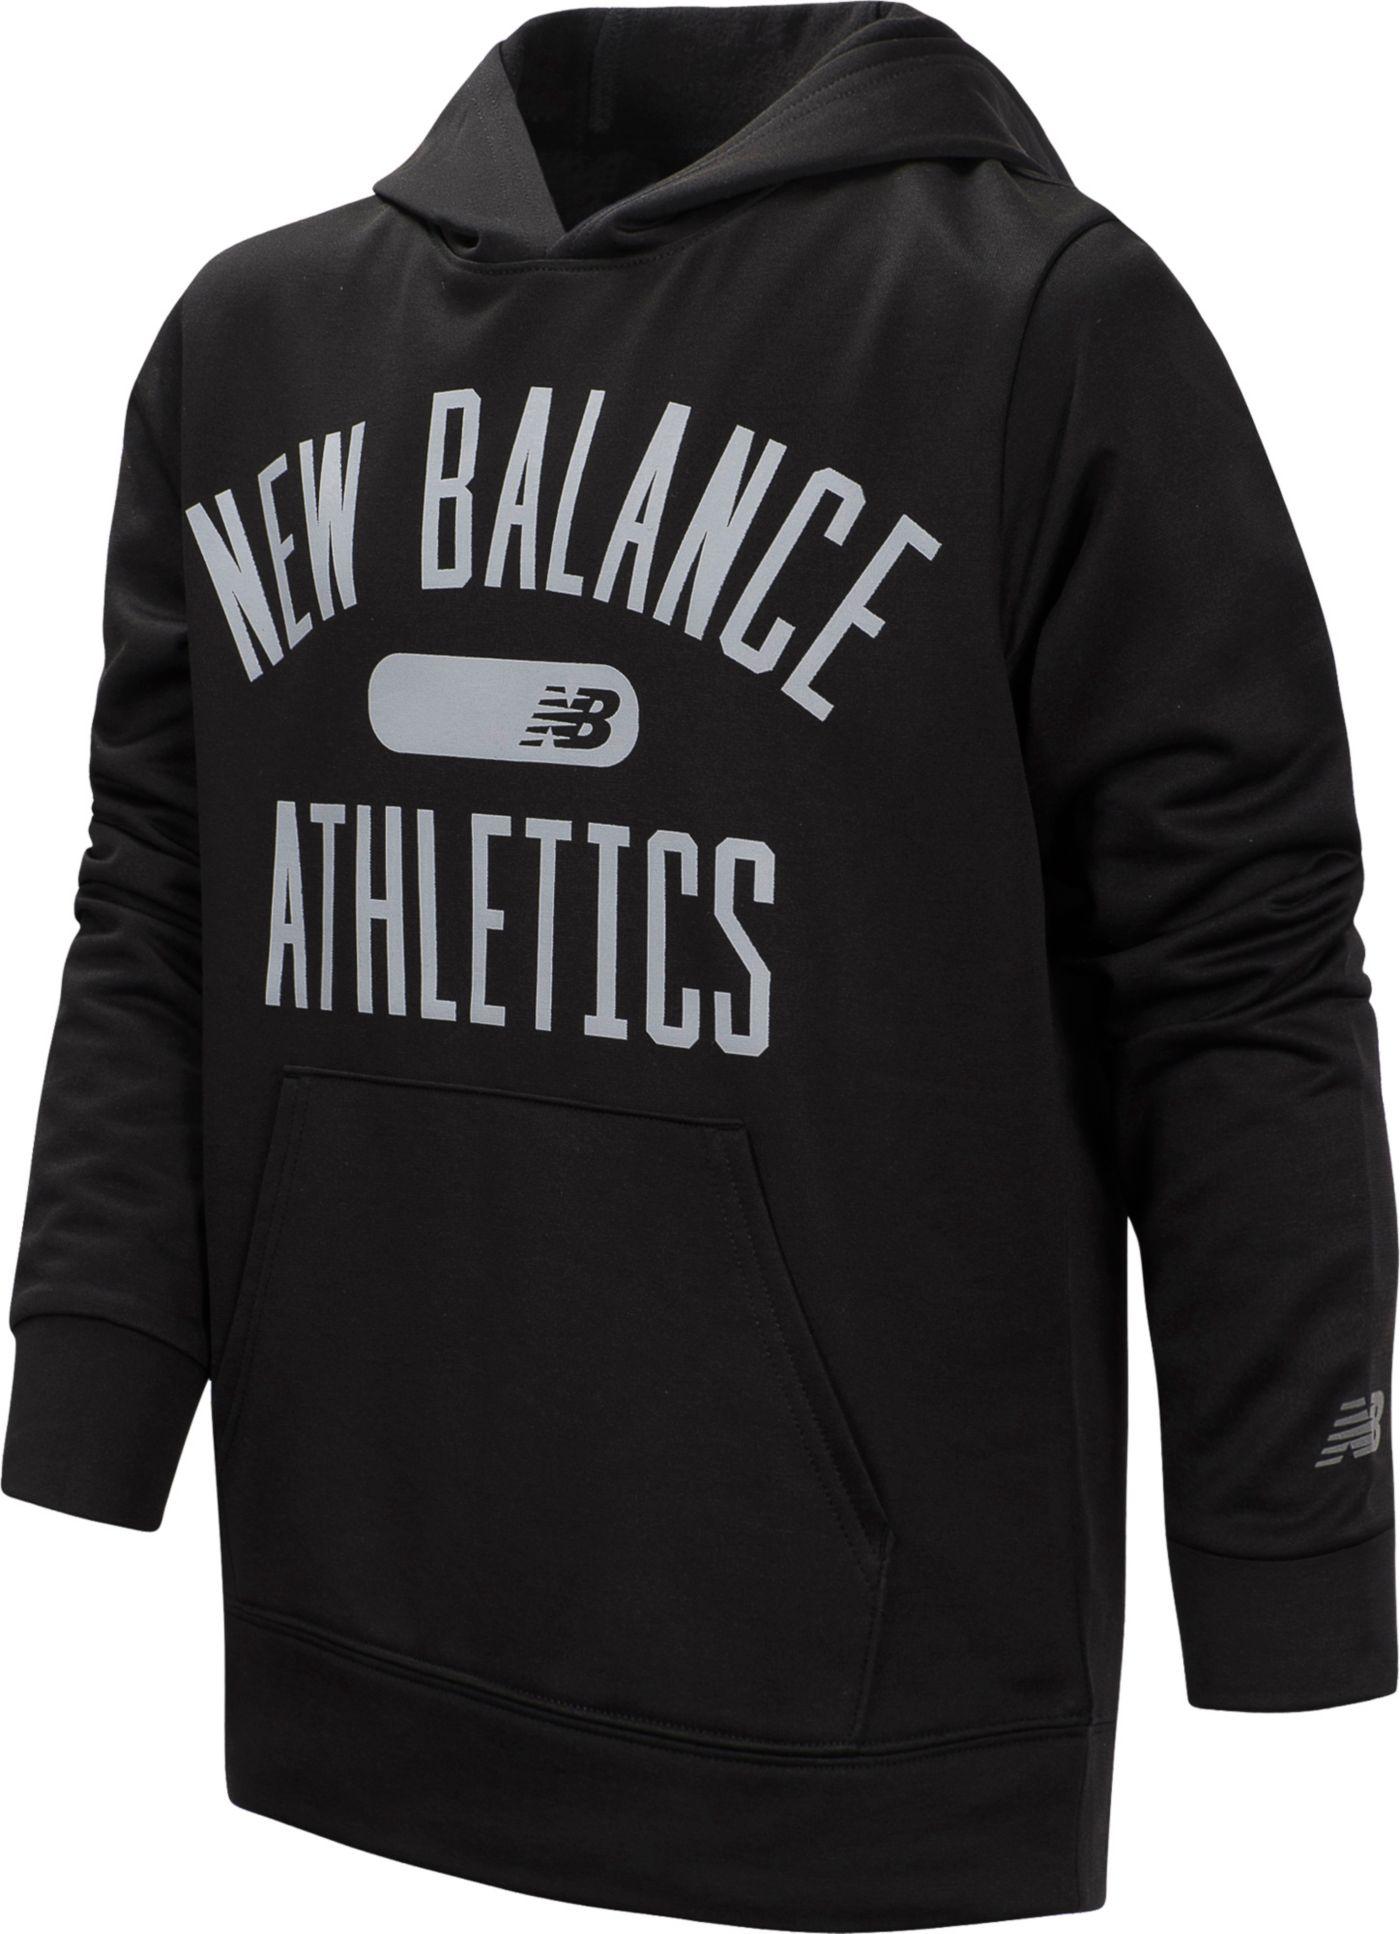 New Balance Boy's Graphic Hoodie